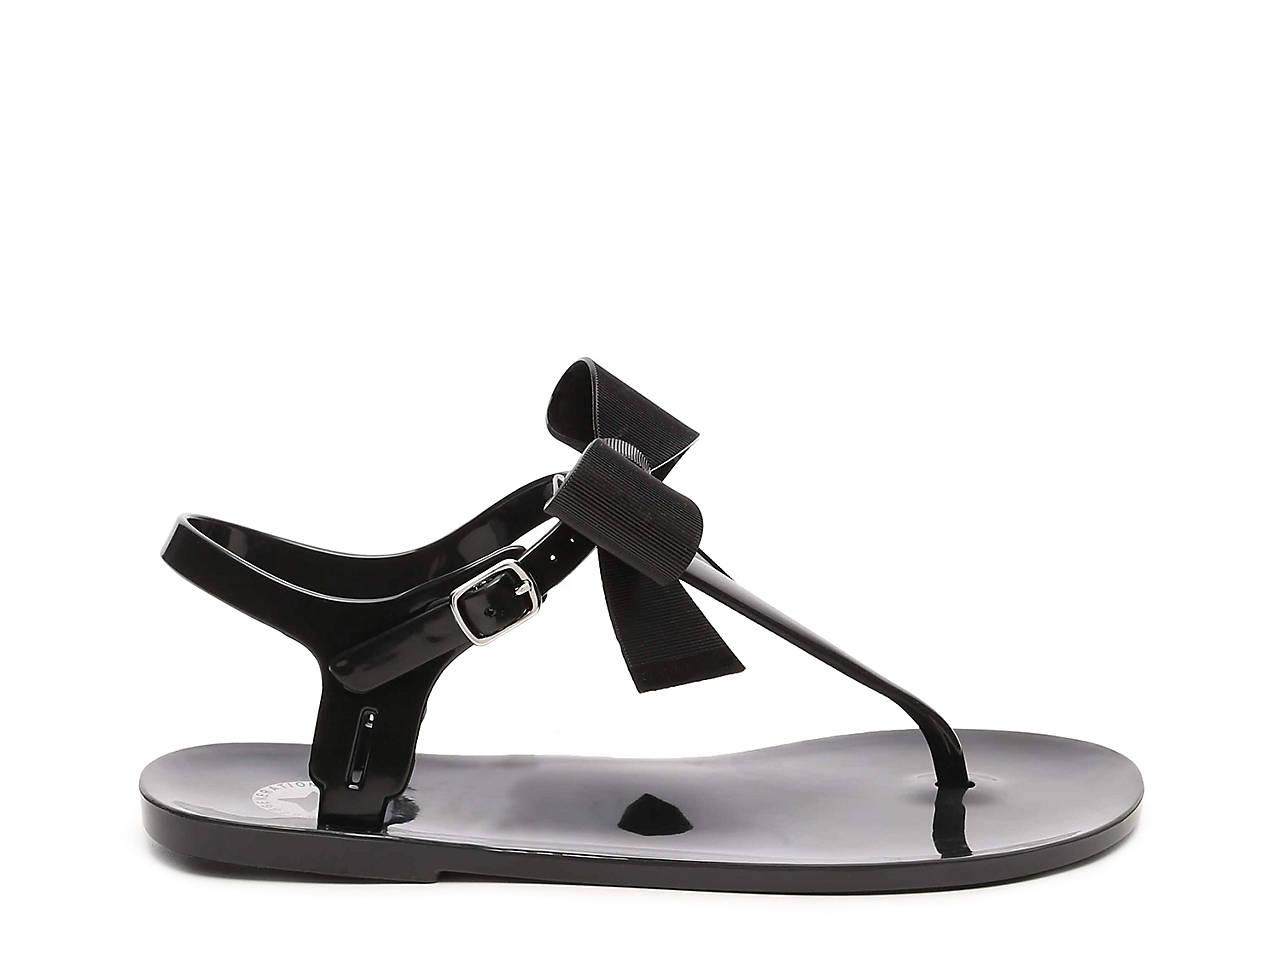 c63a6762b53b BCBGeneration Beena Jelly Sandal Women s Shoes